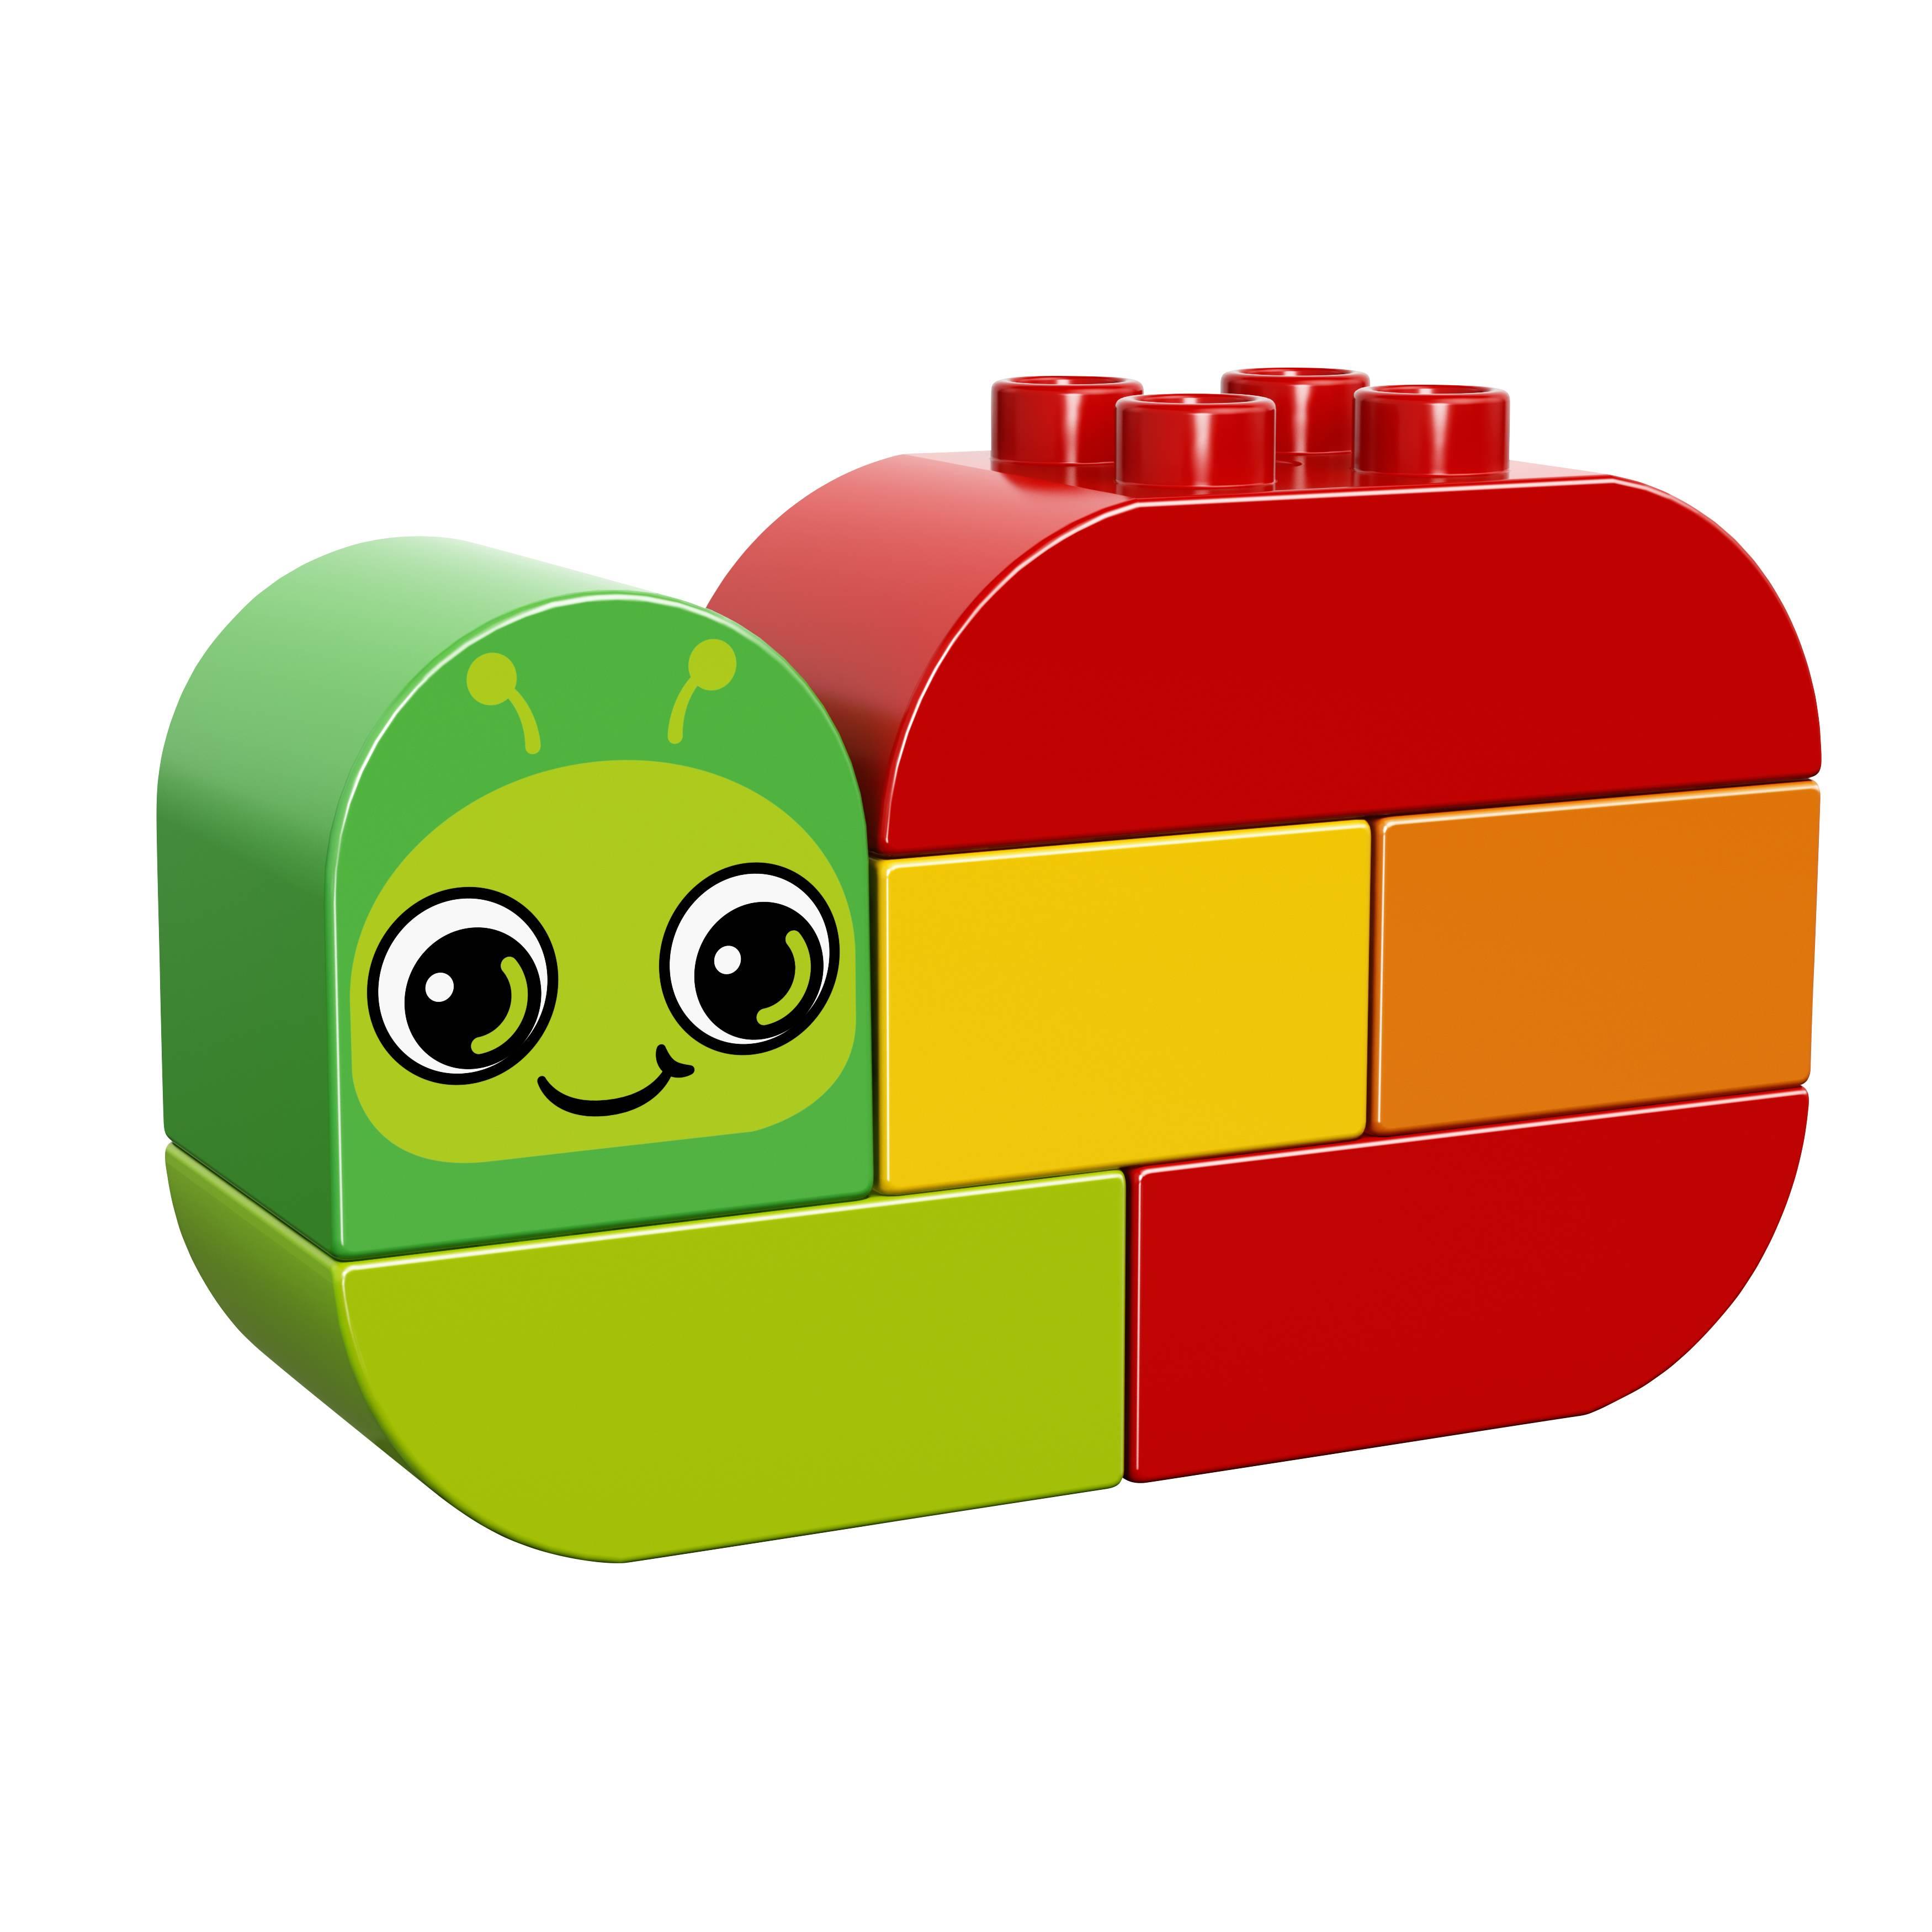 LE MERIDIEN Lego (1)[1]